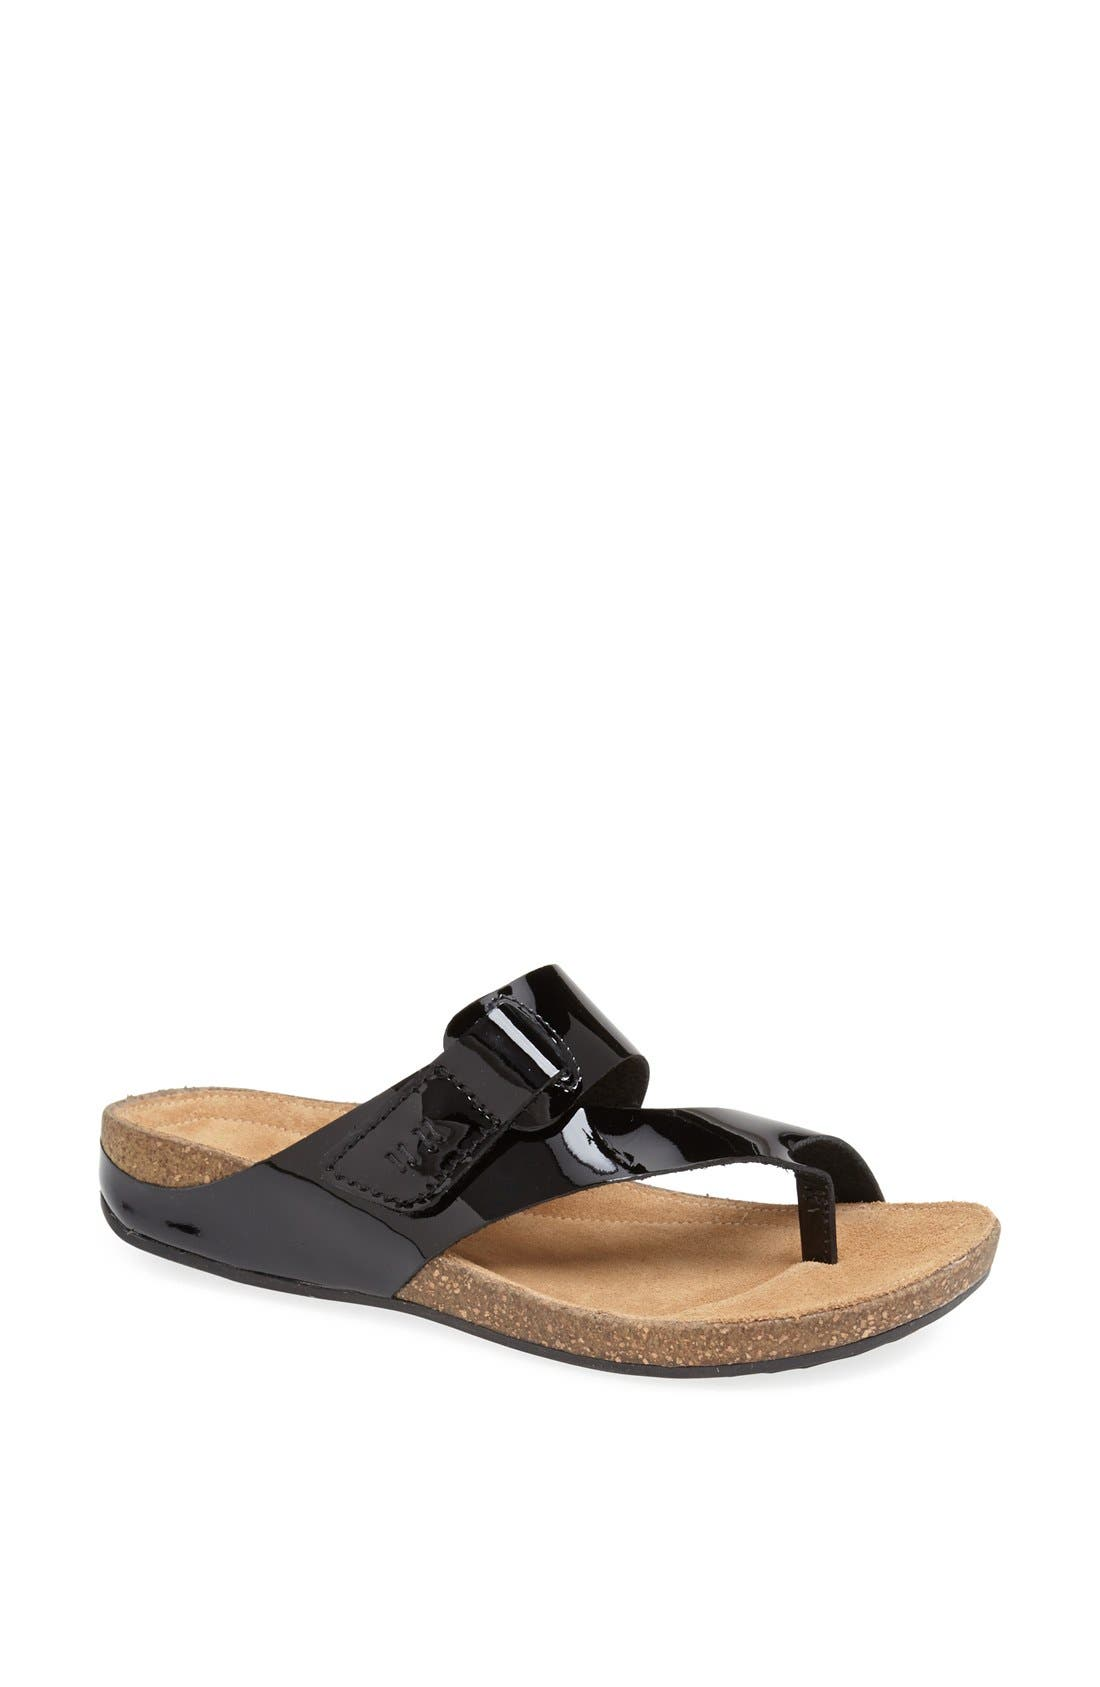 Clarks® 'Perri Coast' Leather Thong Sandal